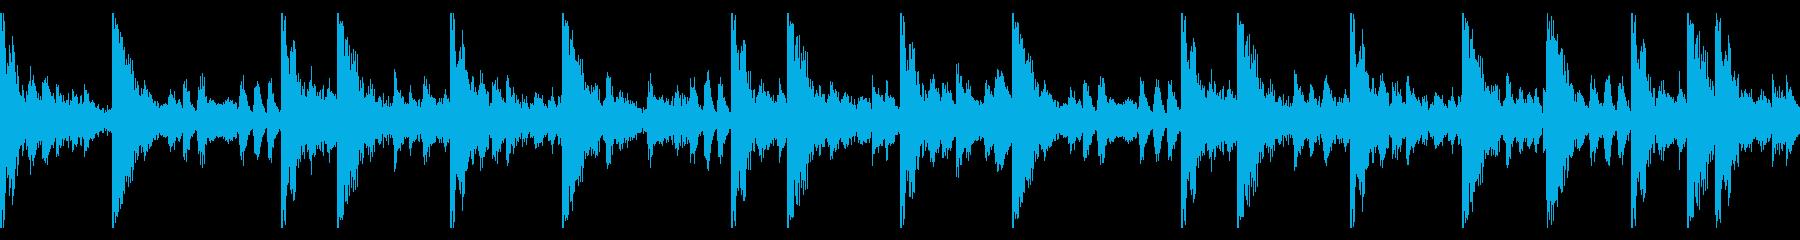 70 BPMの再生済みの波形